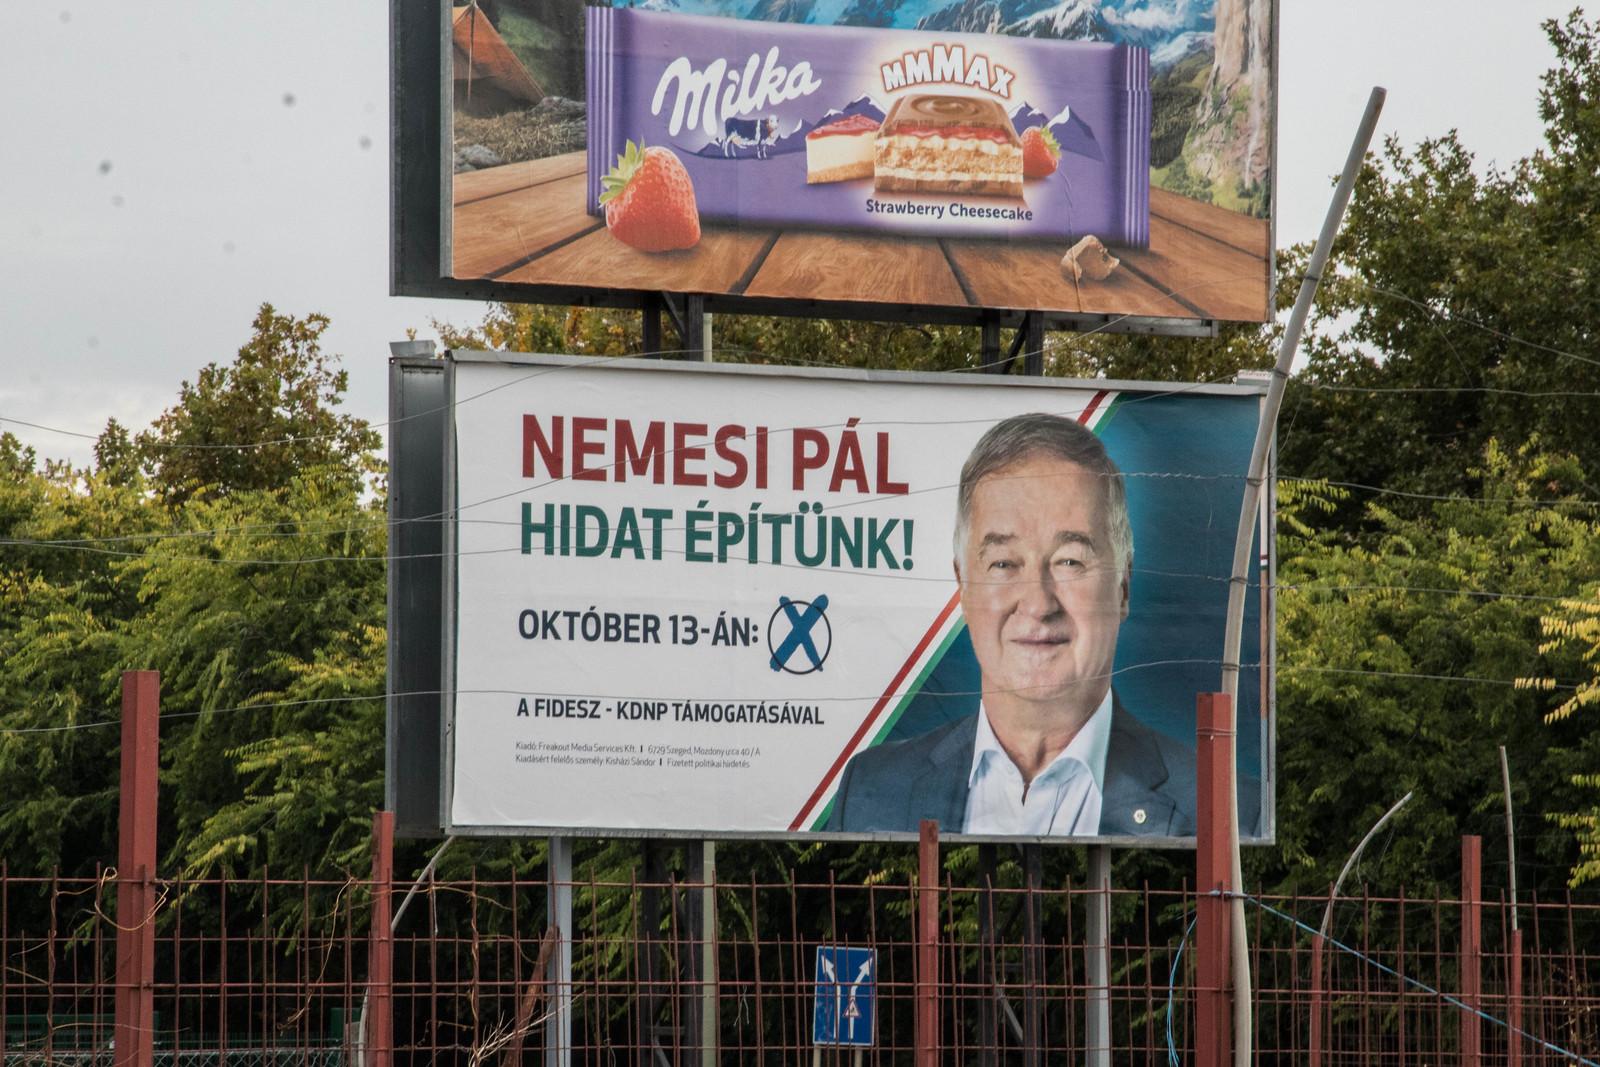 Nemesi Pál: sikerült a kampányt úriember módjára végigvinni